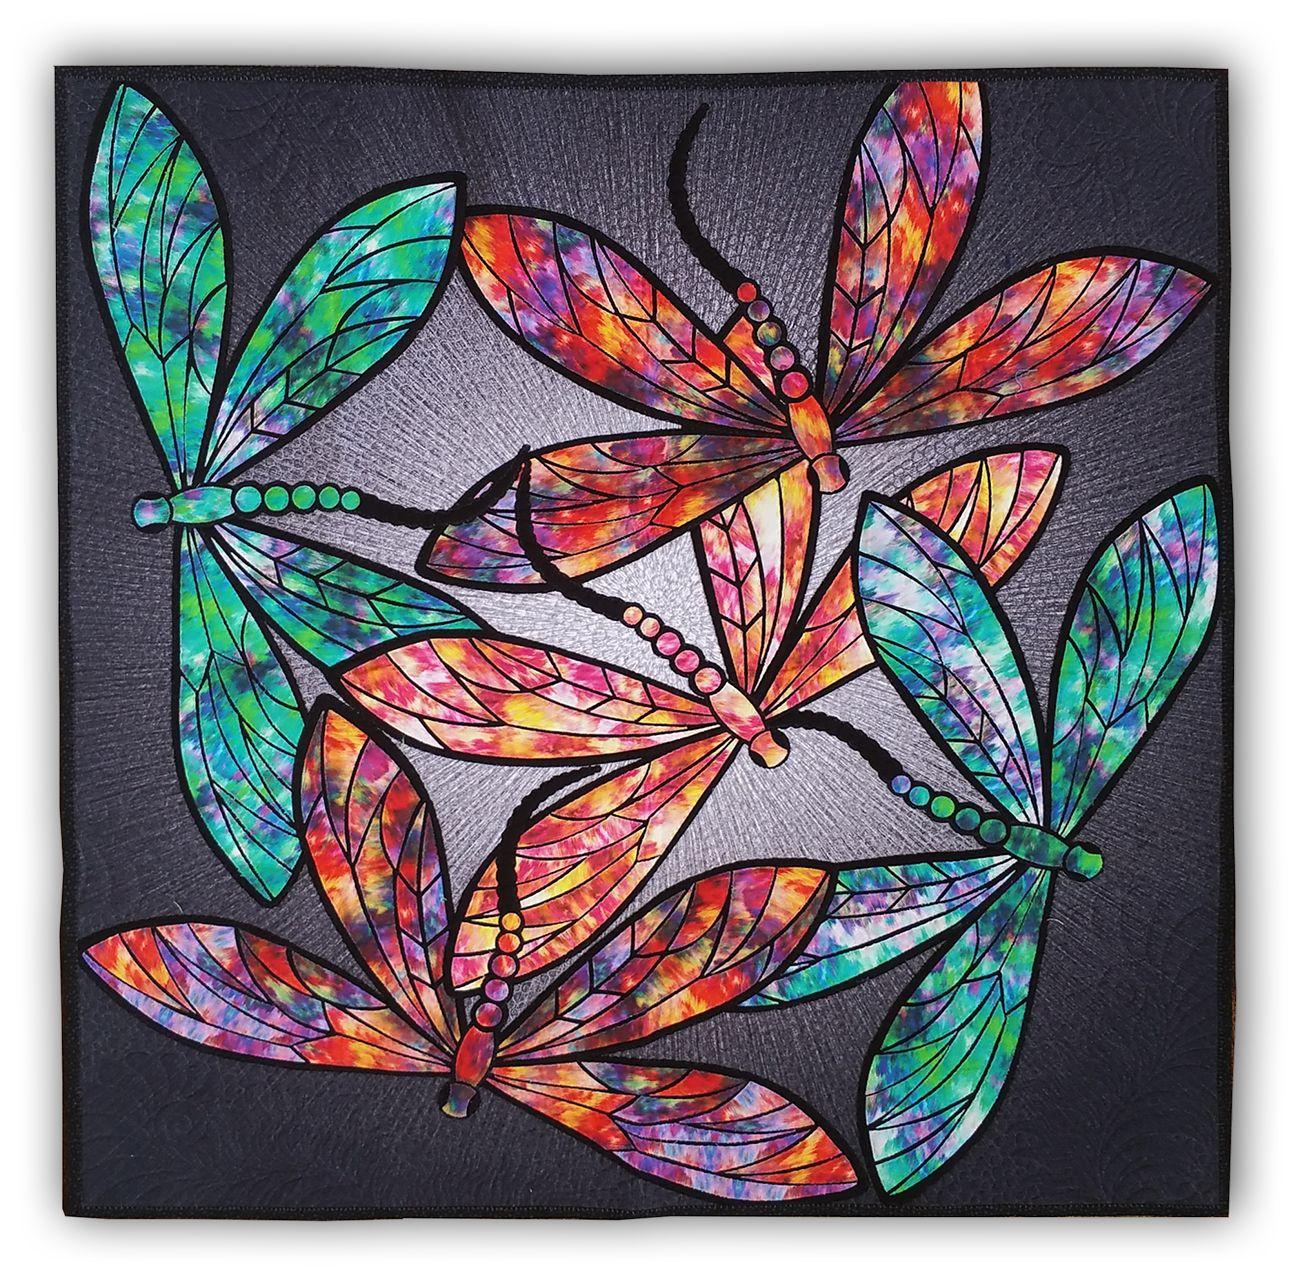 Dance of the Dragonflies Quilt Kit & Optional Swarovski Hotfix ... : dragonfly quilt - Adamdwight.com